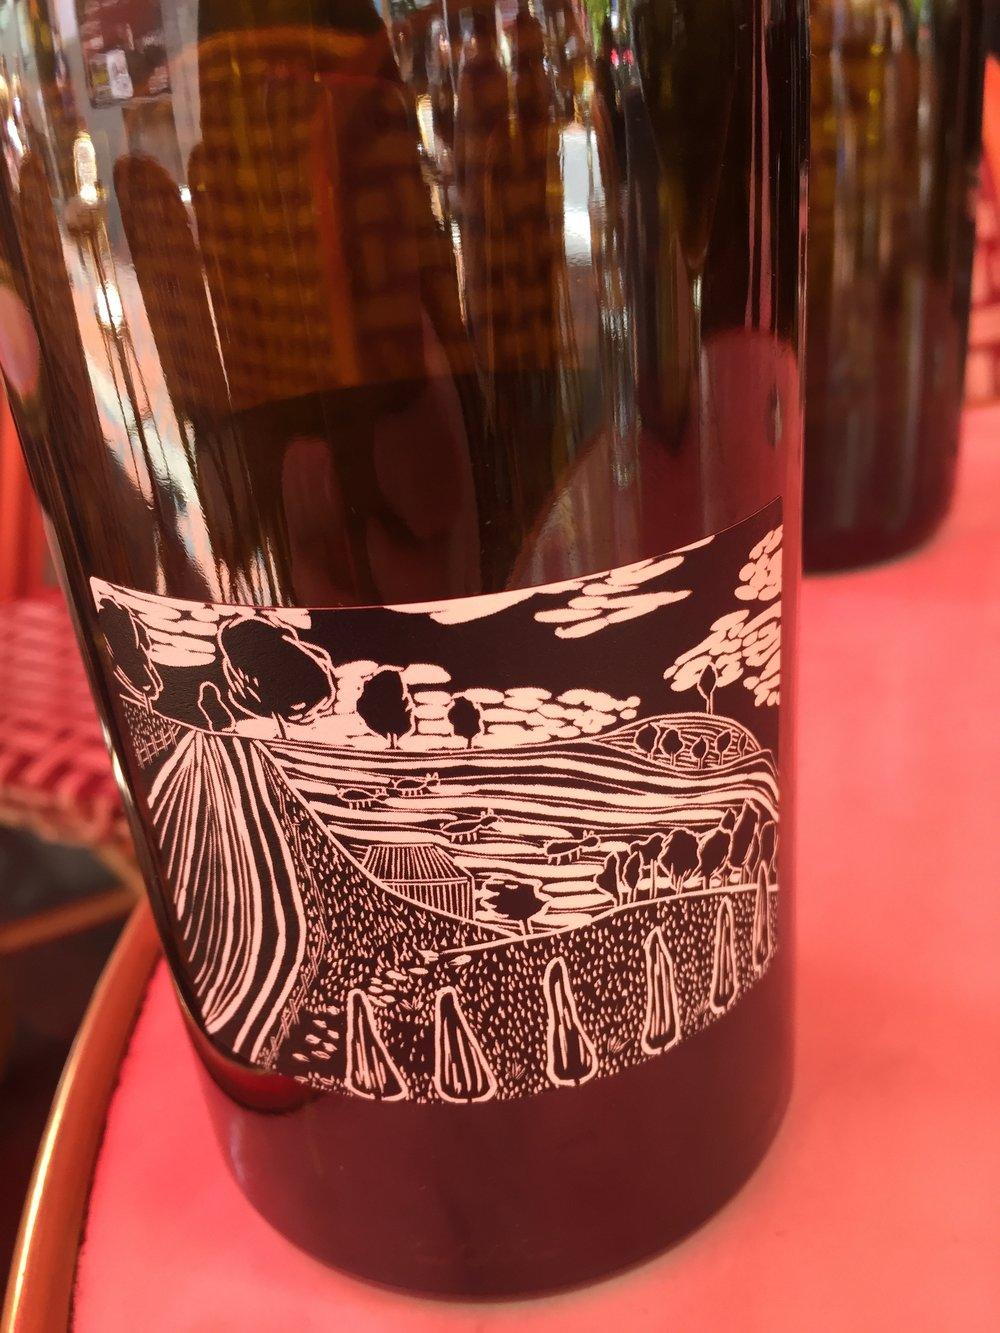 Joshua Cooper Pinot Noir, Macedon Ranges